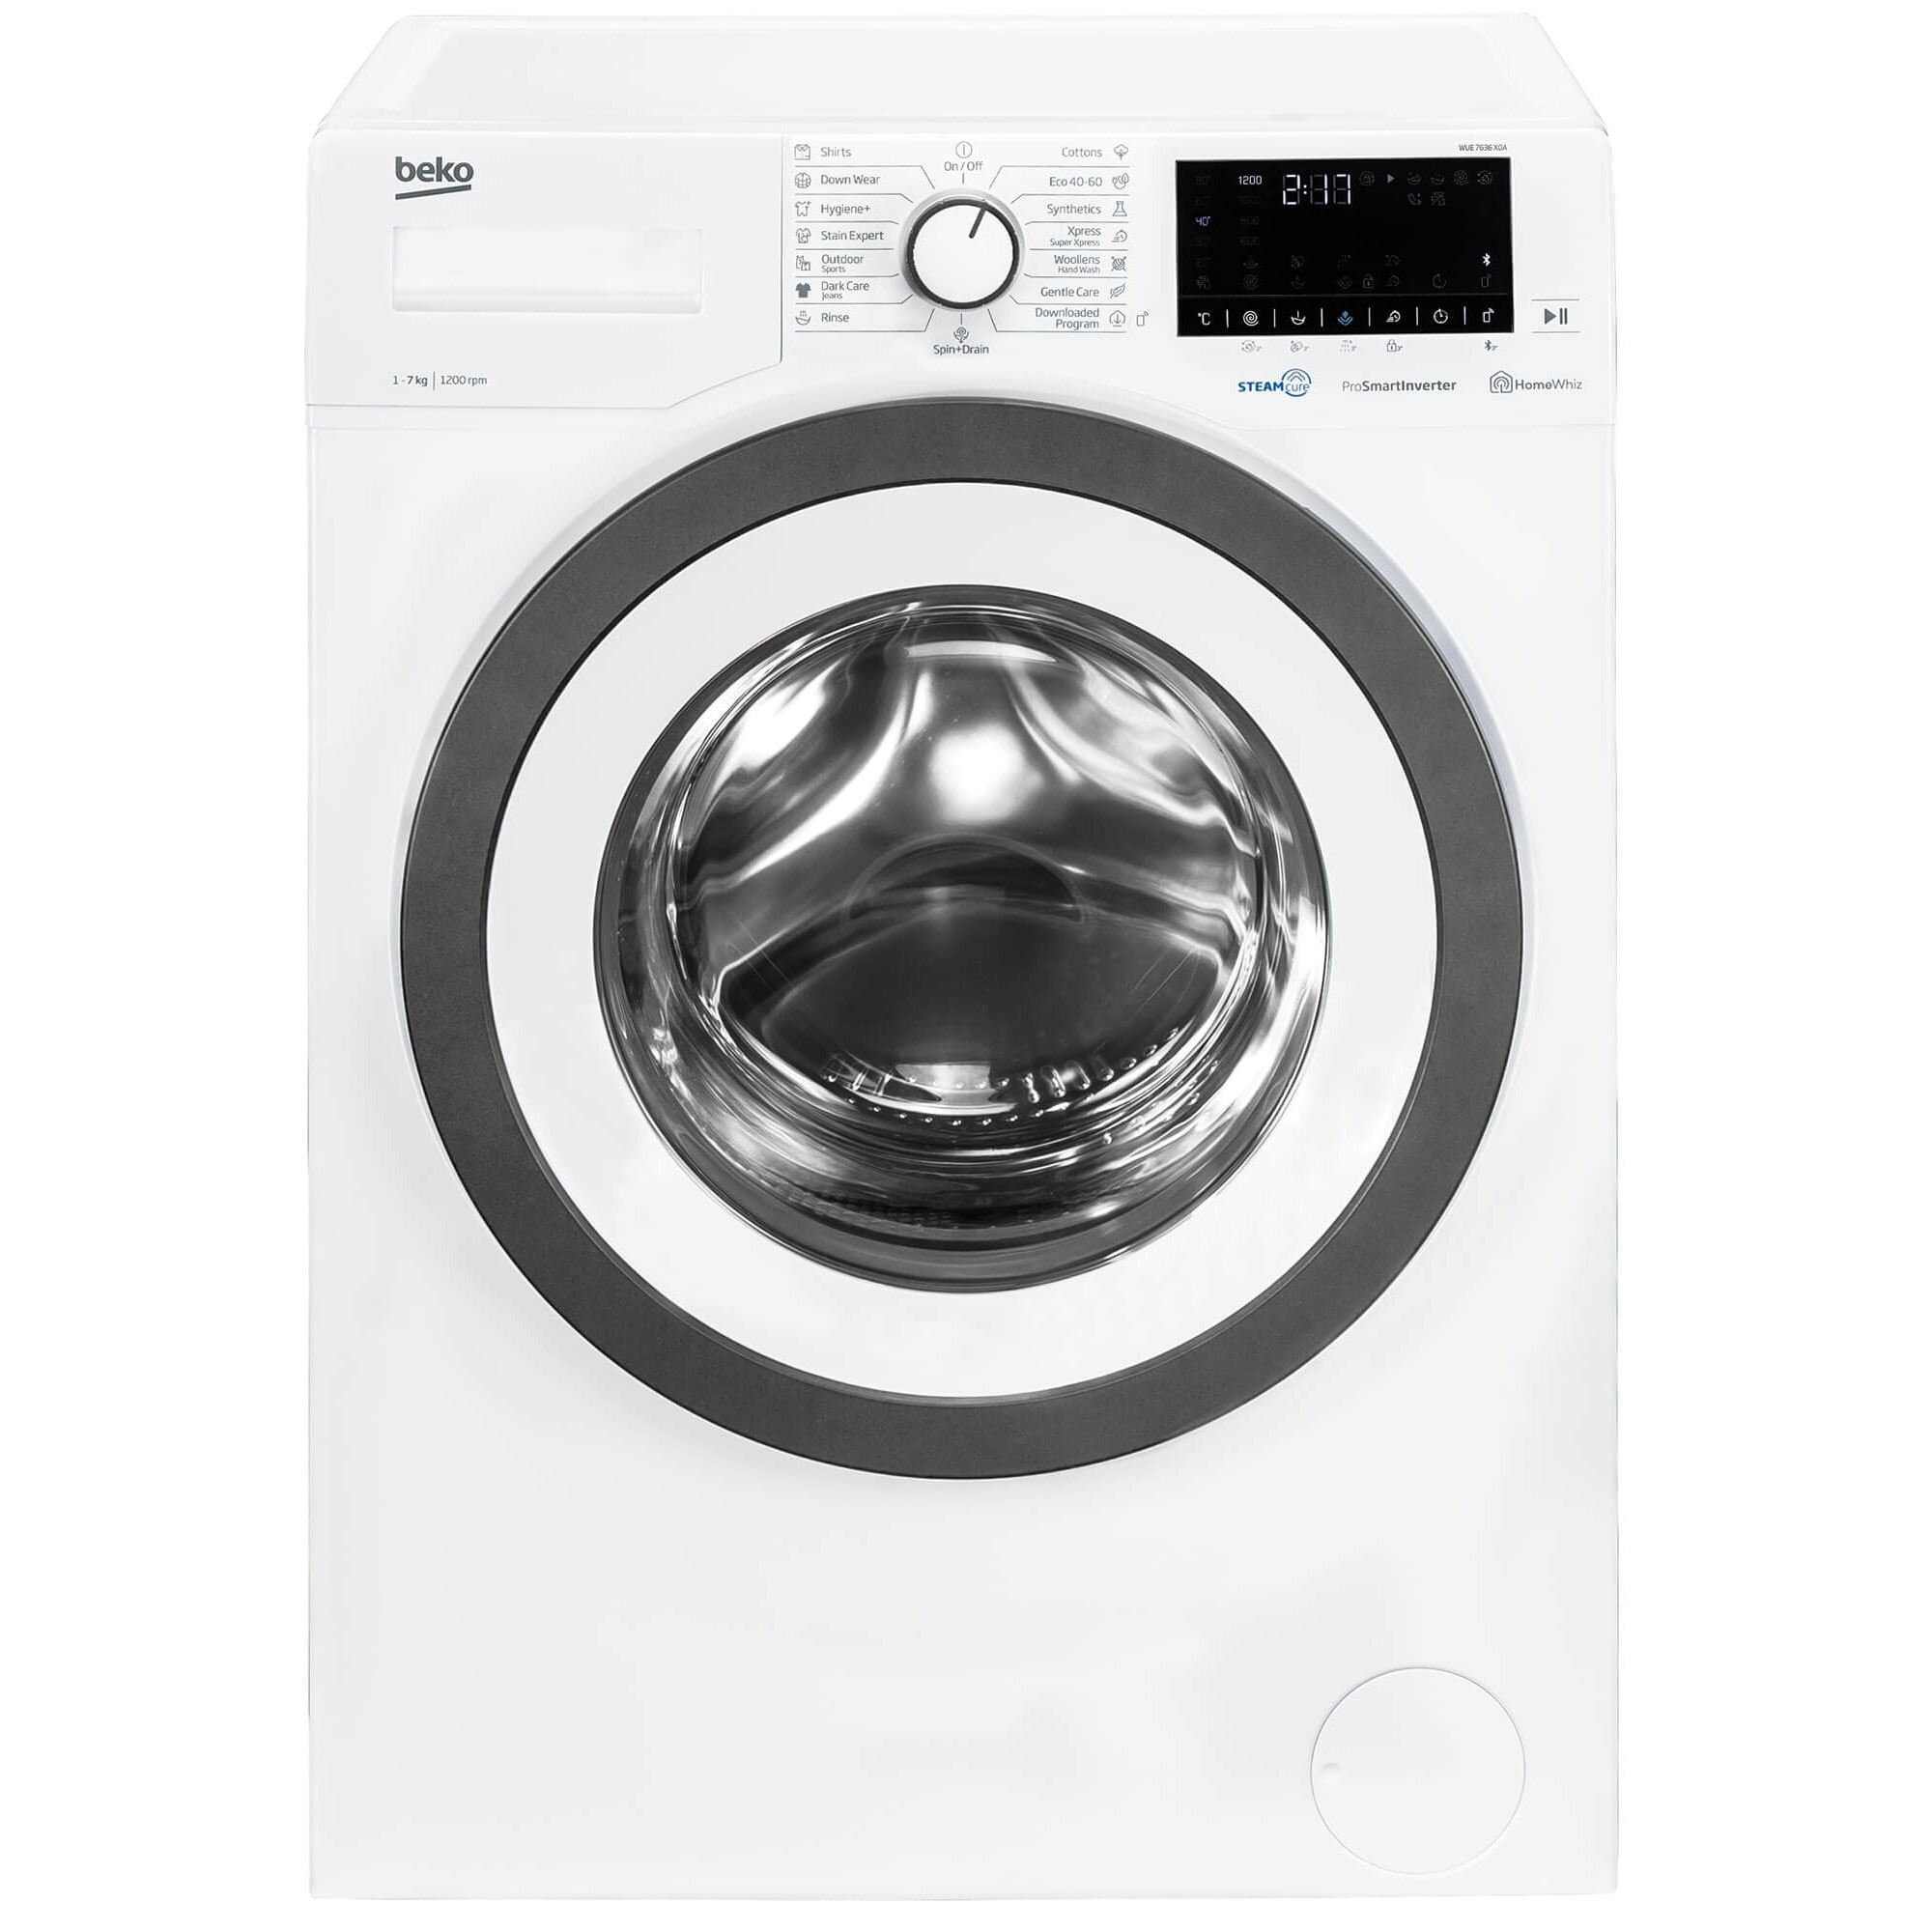 Fotografie Masina de spalat rufe slim Beko WUE7636X0A, 7 kg, 1200 rpm, Clasa D, Motor ProSmart Inverter, HomeWhiz Bluetooth, SteamCure, Hygiene, AddXtra, Alb